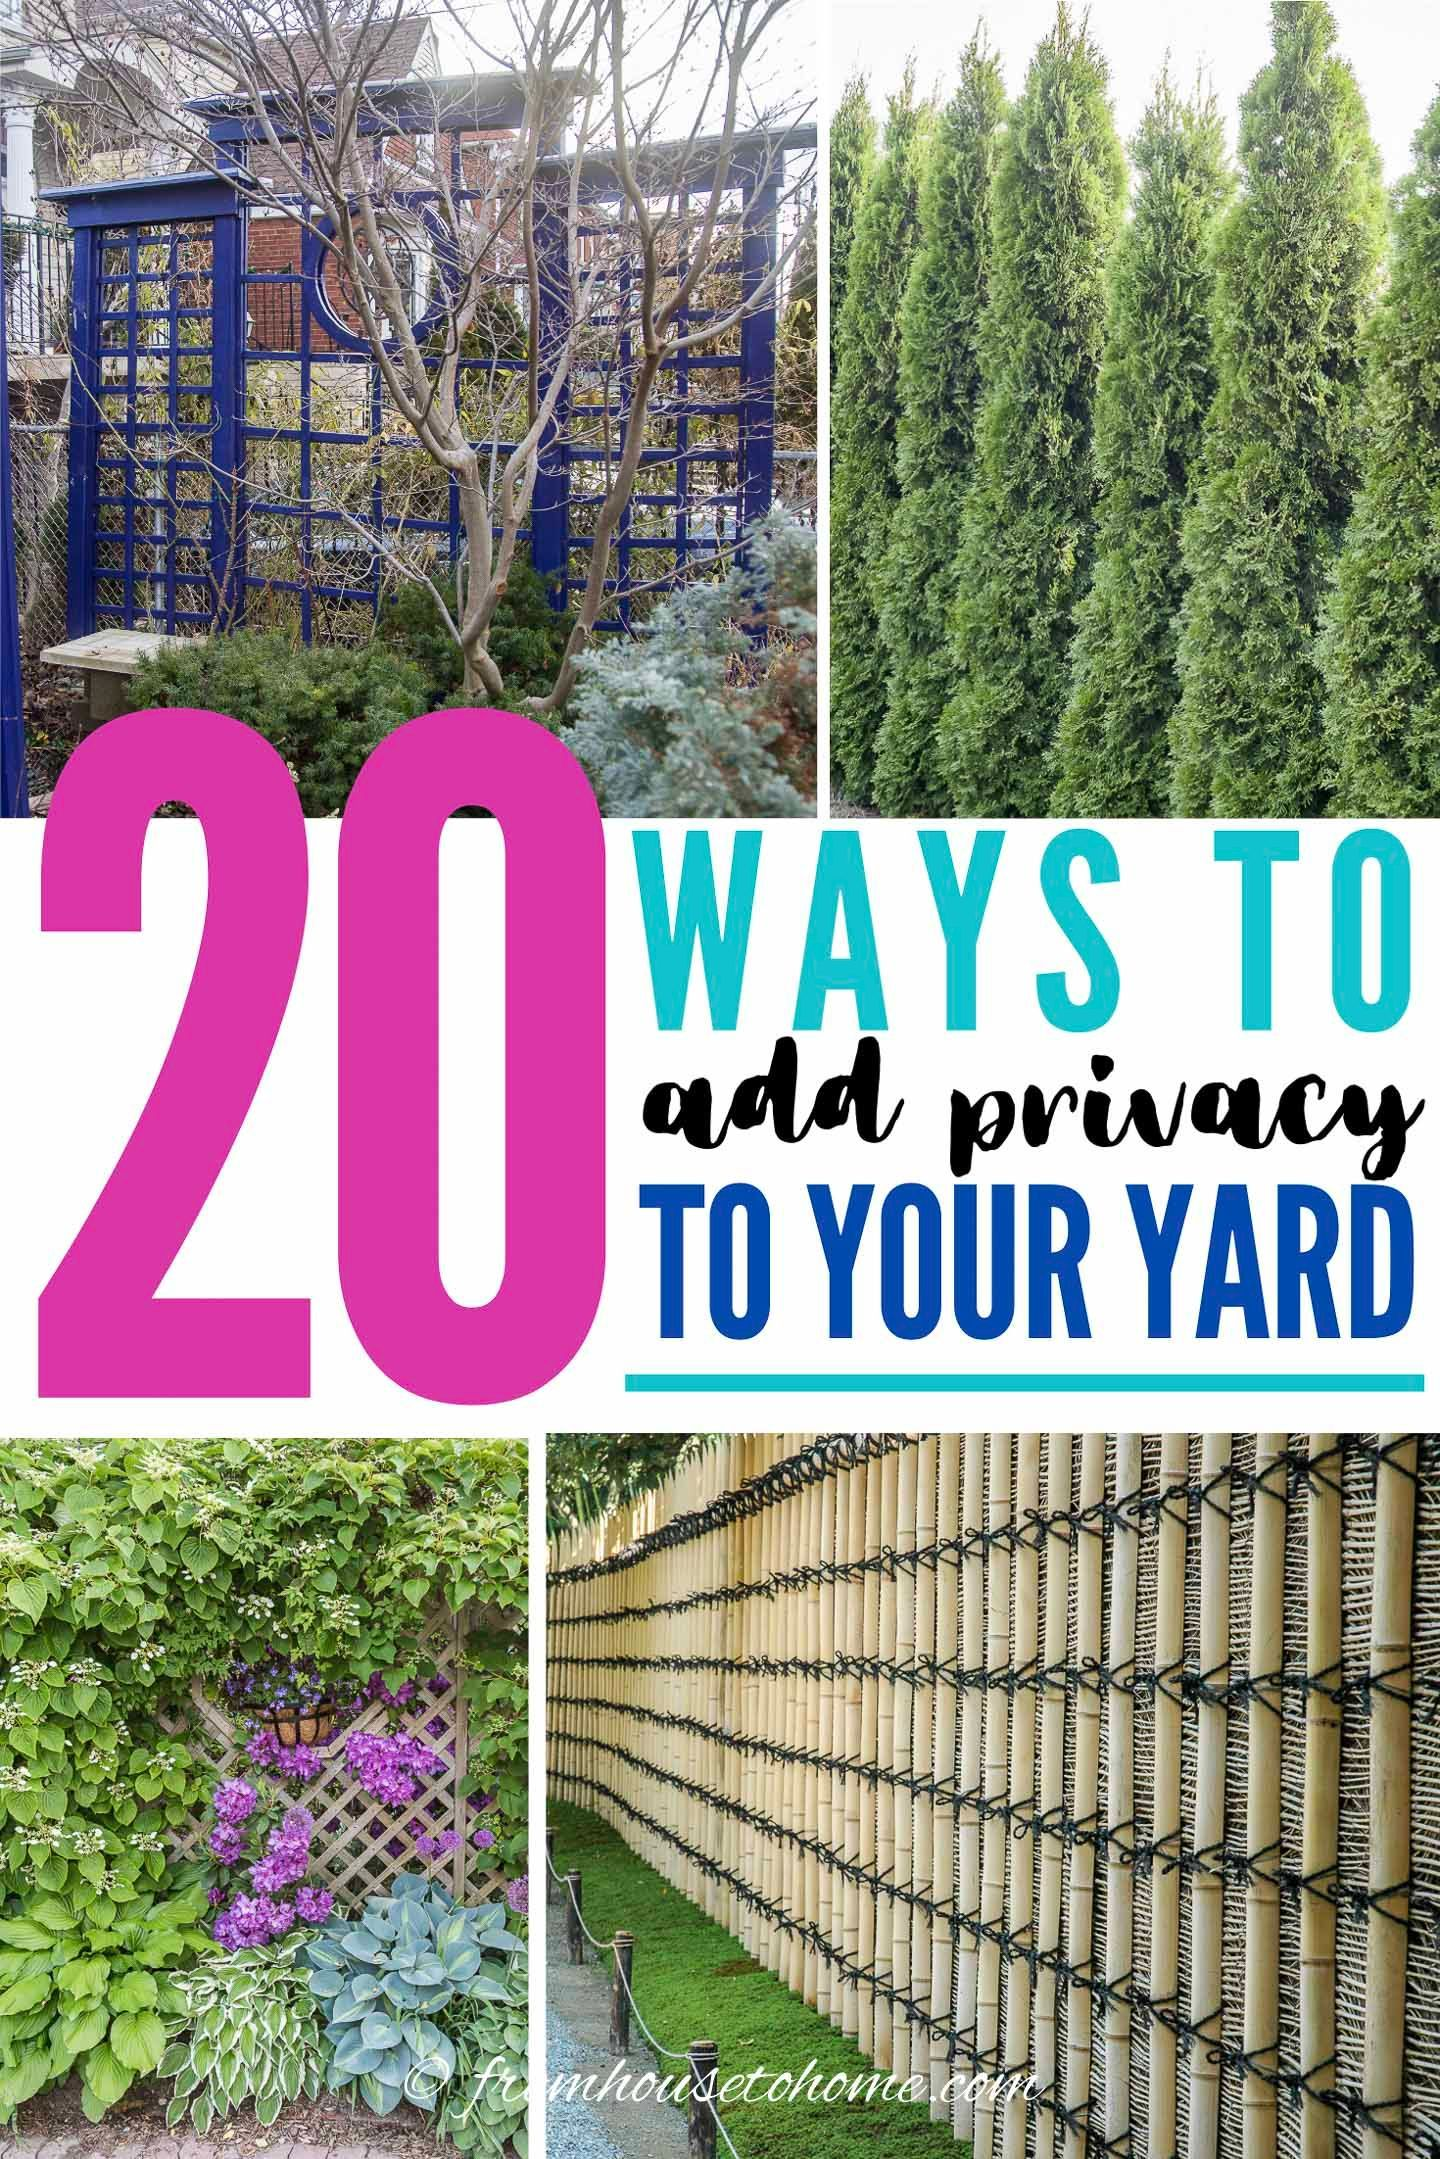 Privacy Garden Screening Ideas Free Standing Outdoor Privacy Screens Deck Plants Trendy Living Room Color Good D Diy Garden Fence Garden Storage Garden Privacy